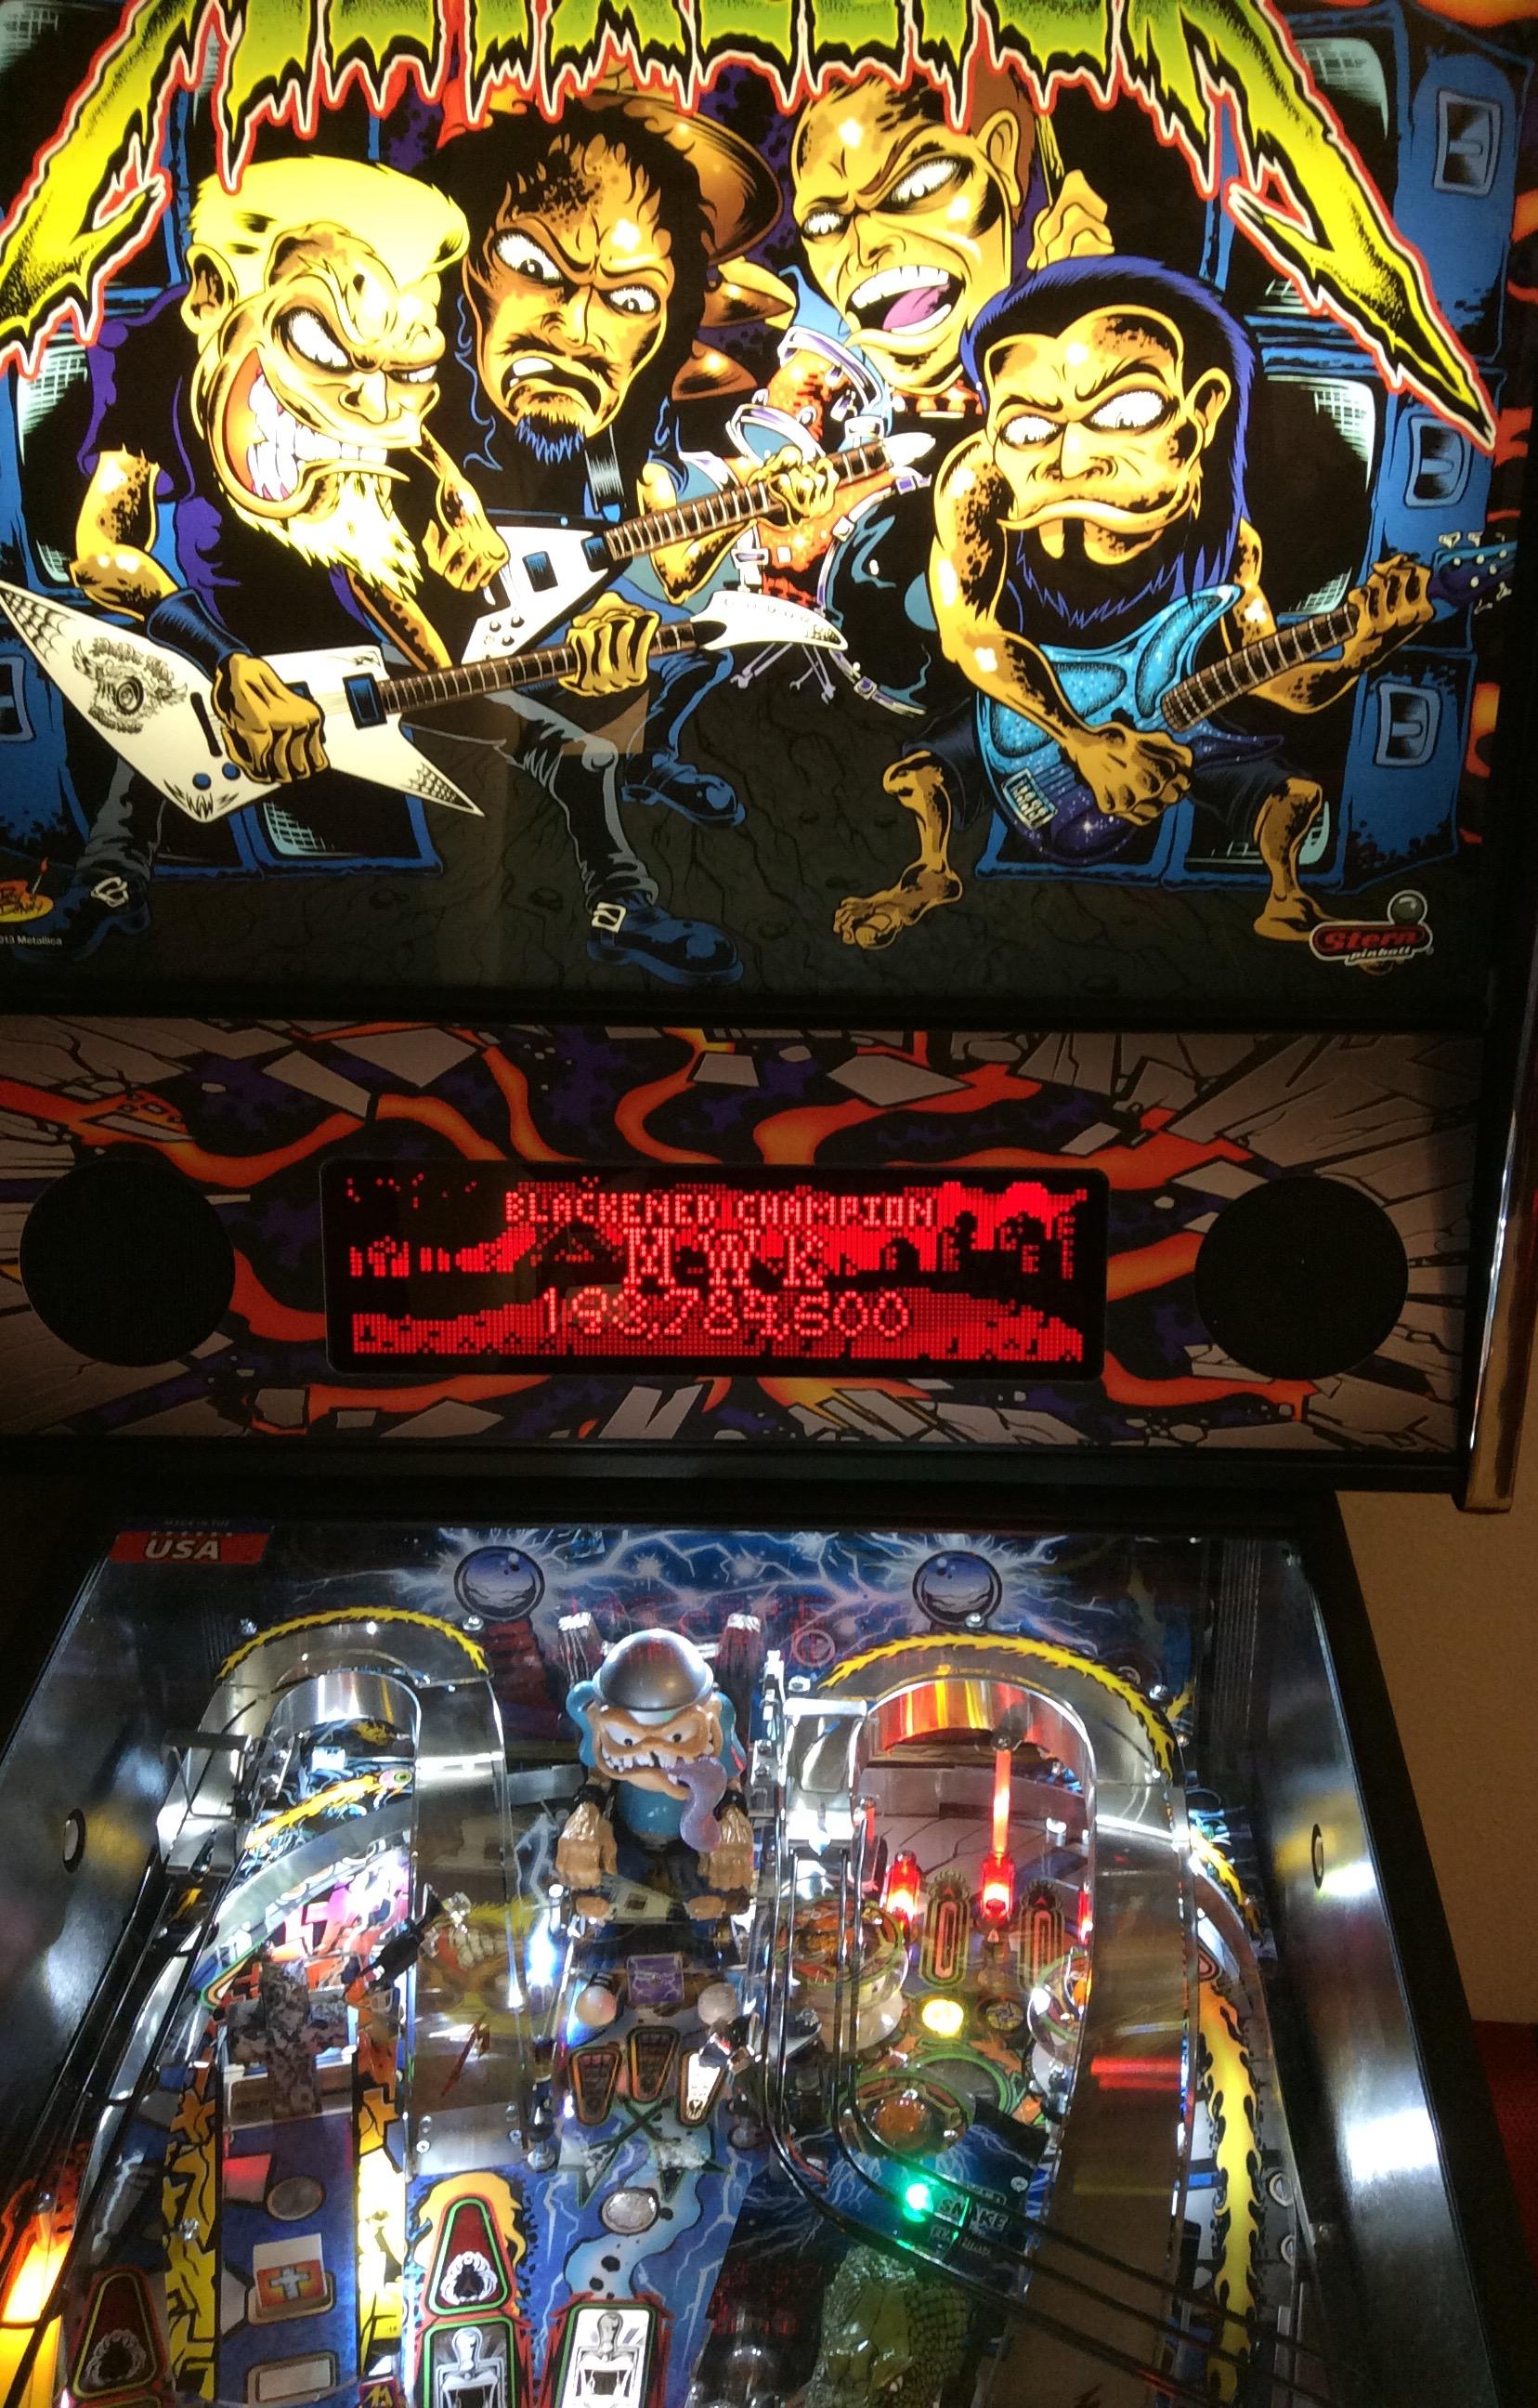 euphonium: Metallica: Blackened (Pinball Bonus Mode) 193,784,500 points on 2016-09-11 22:18:07